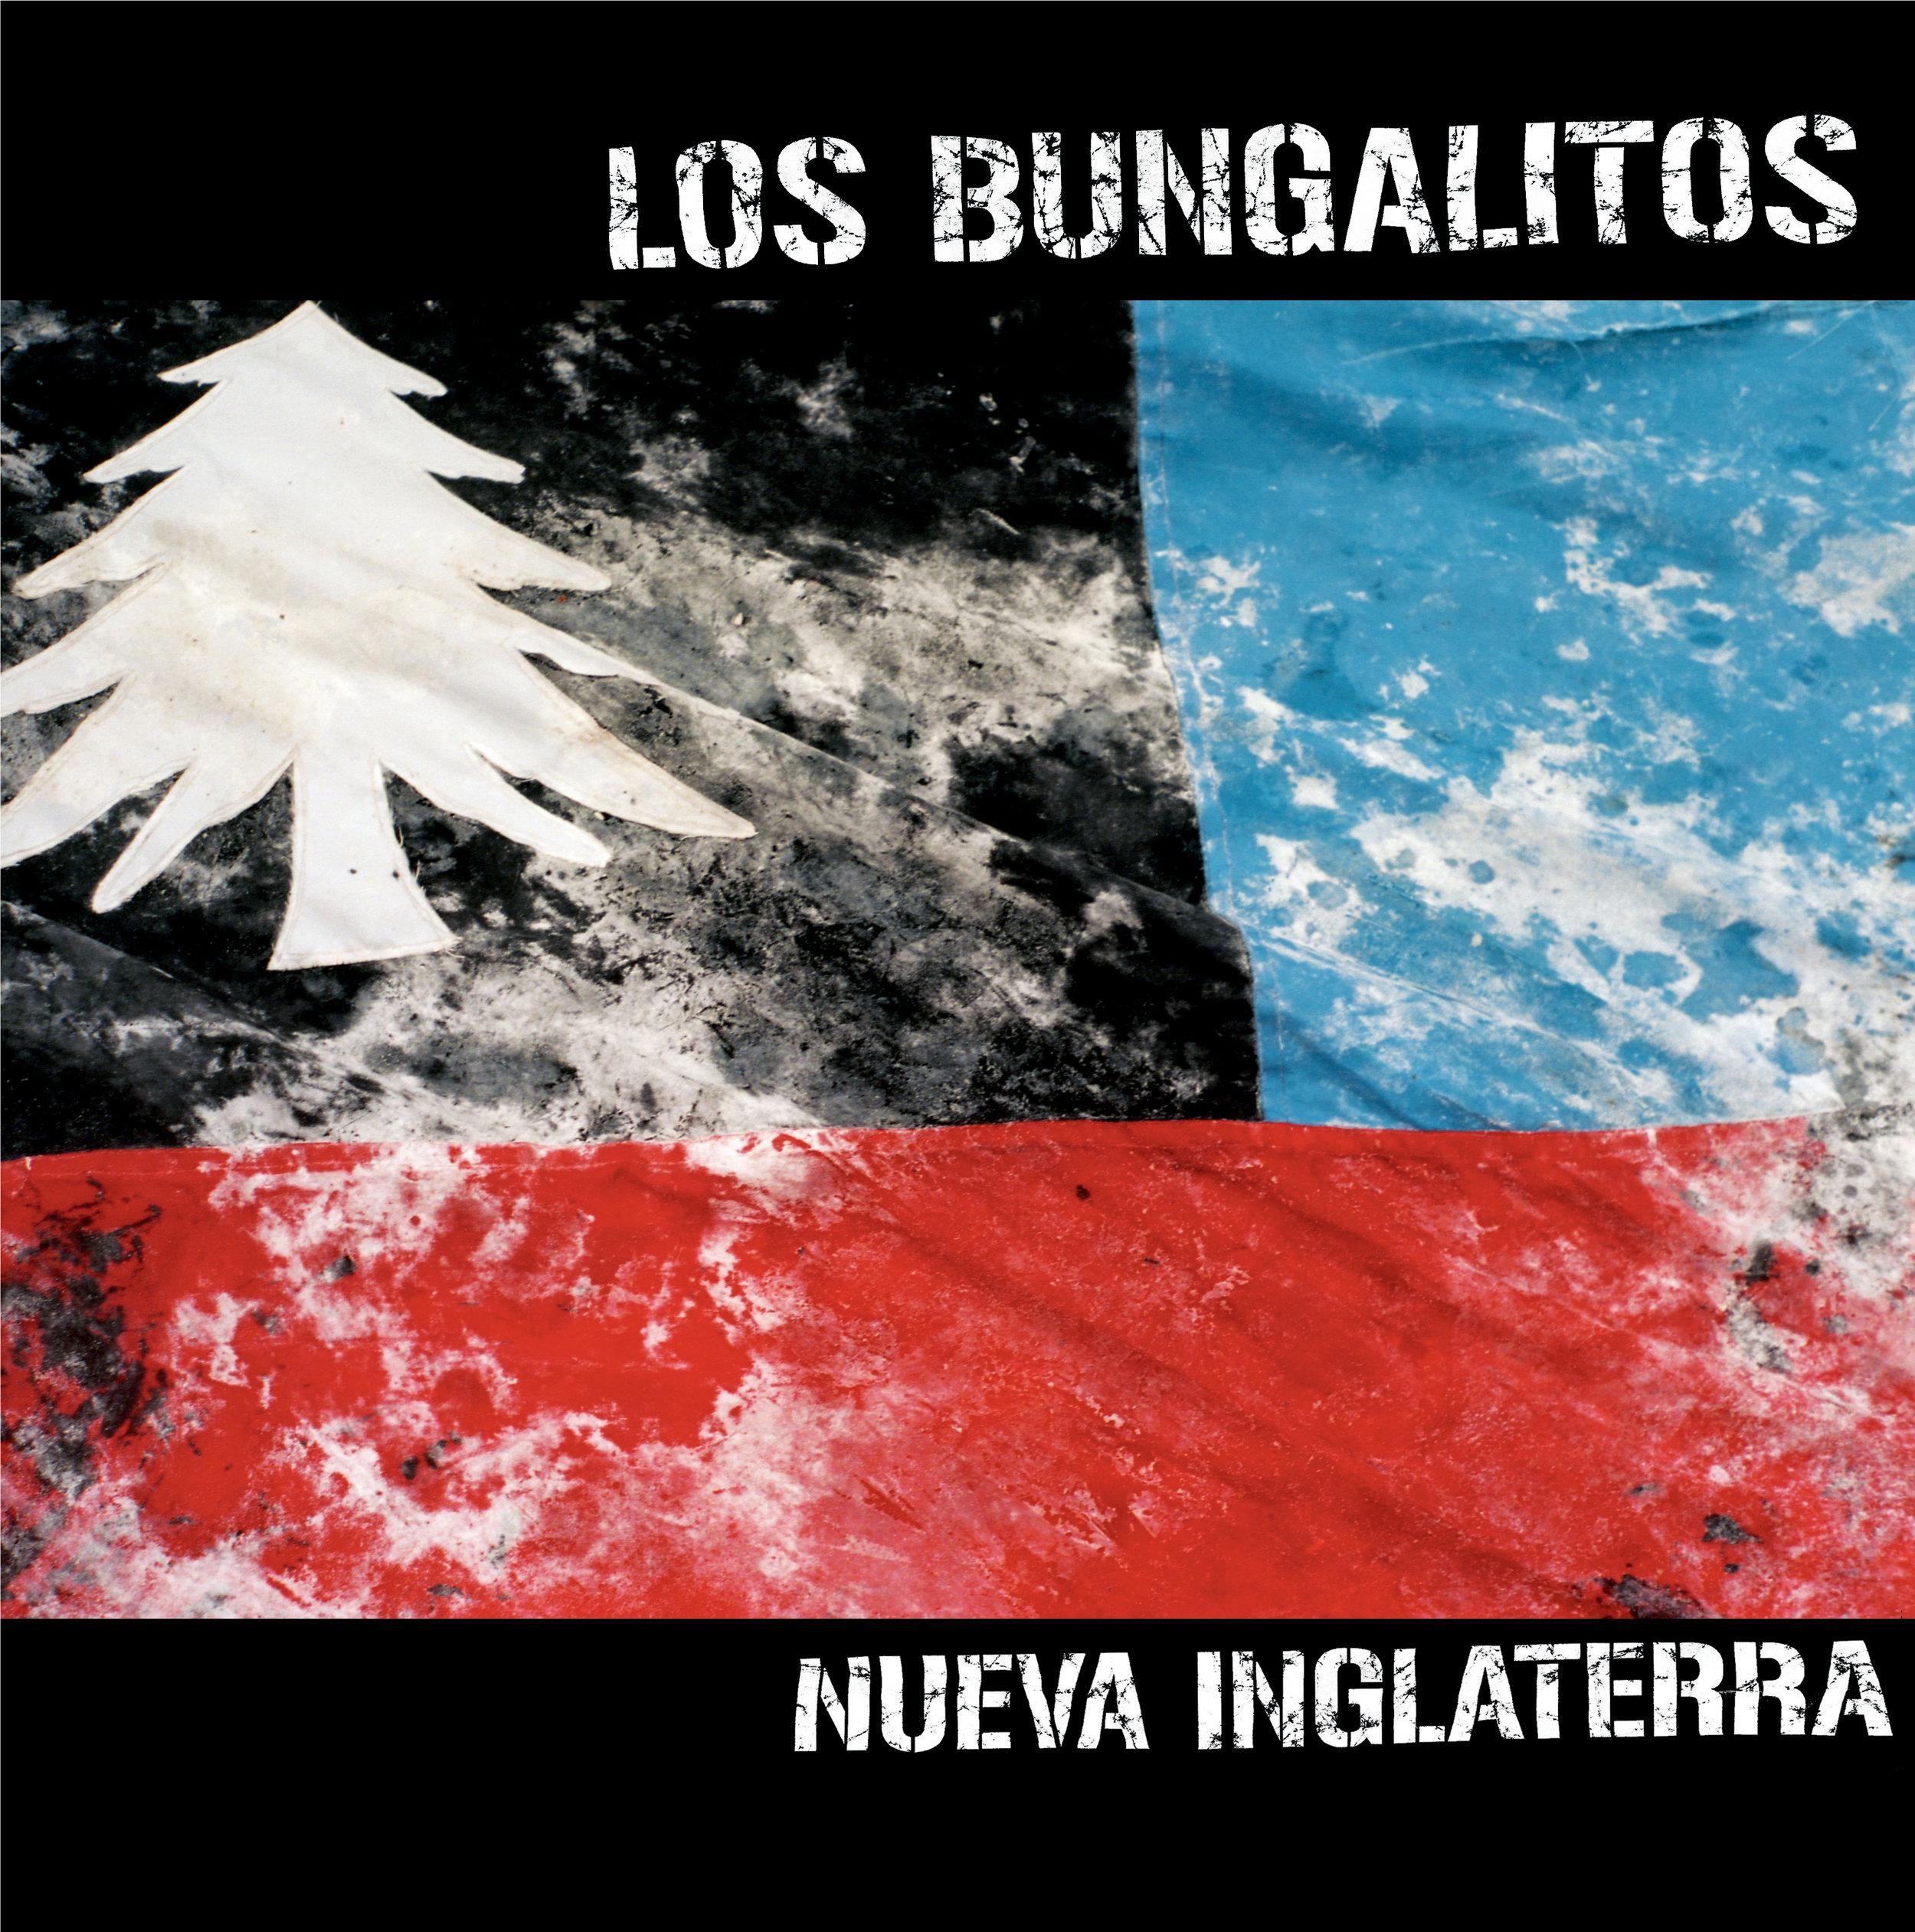 Los Bungalitos Nueva Inglaterra Album Cover 2018